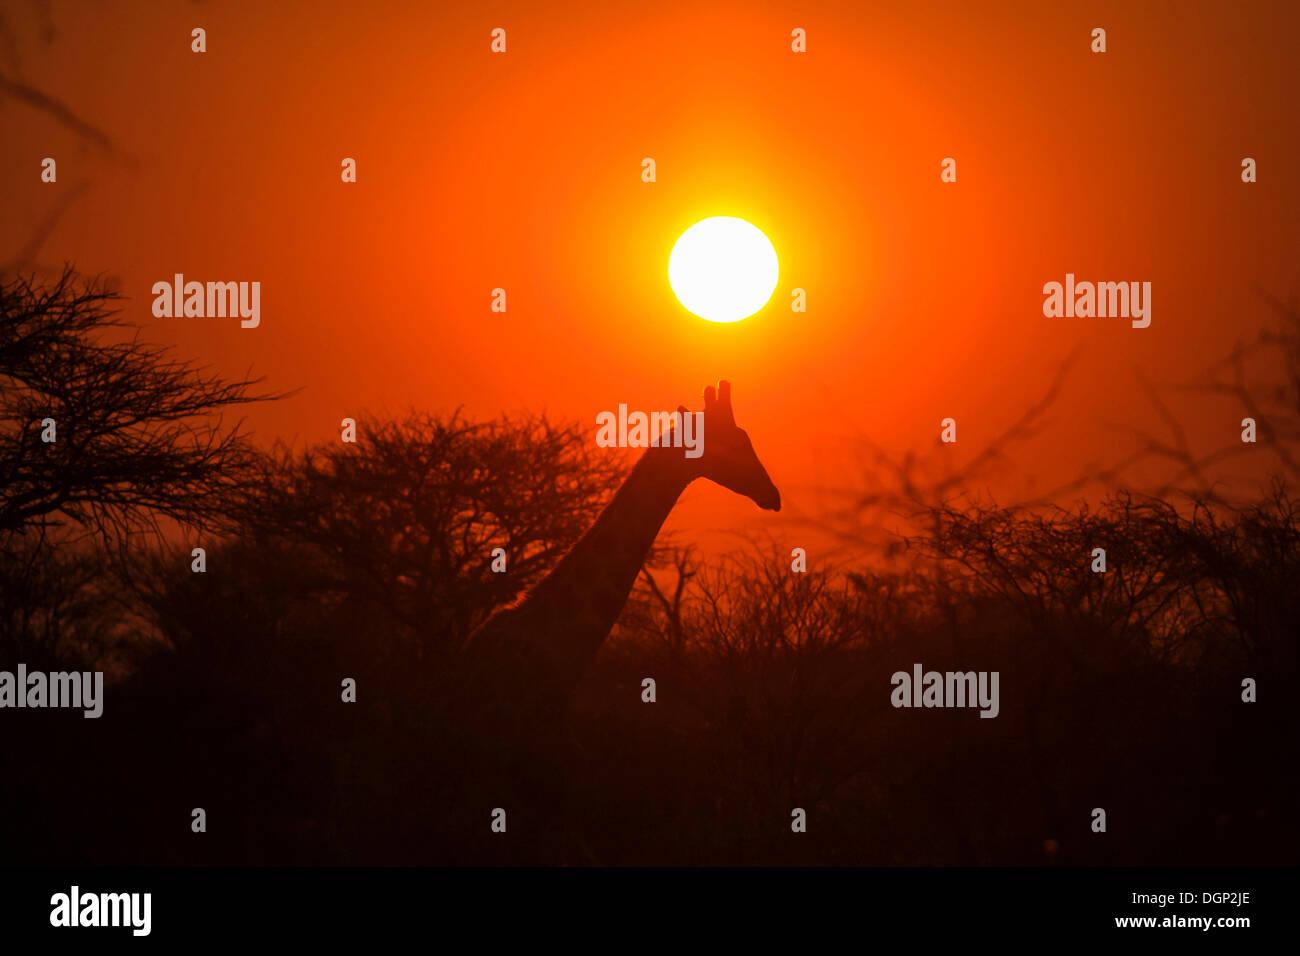 Girafe (Giraffa camelopardalis) devant le coucher du soleil, la Namibie, l'Afrique Photo Stock